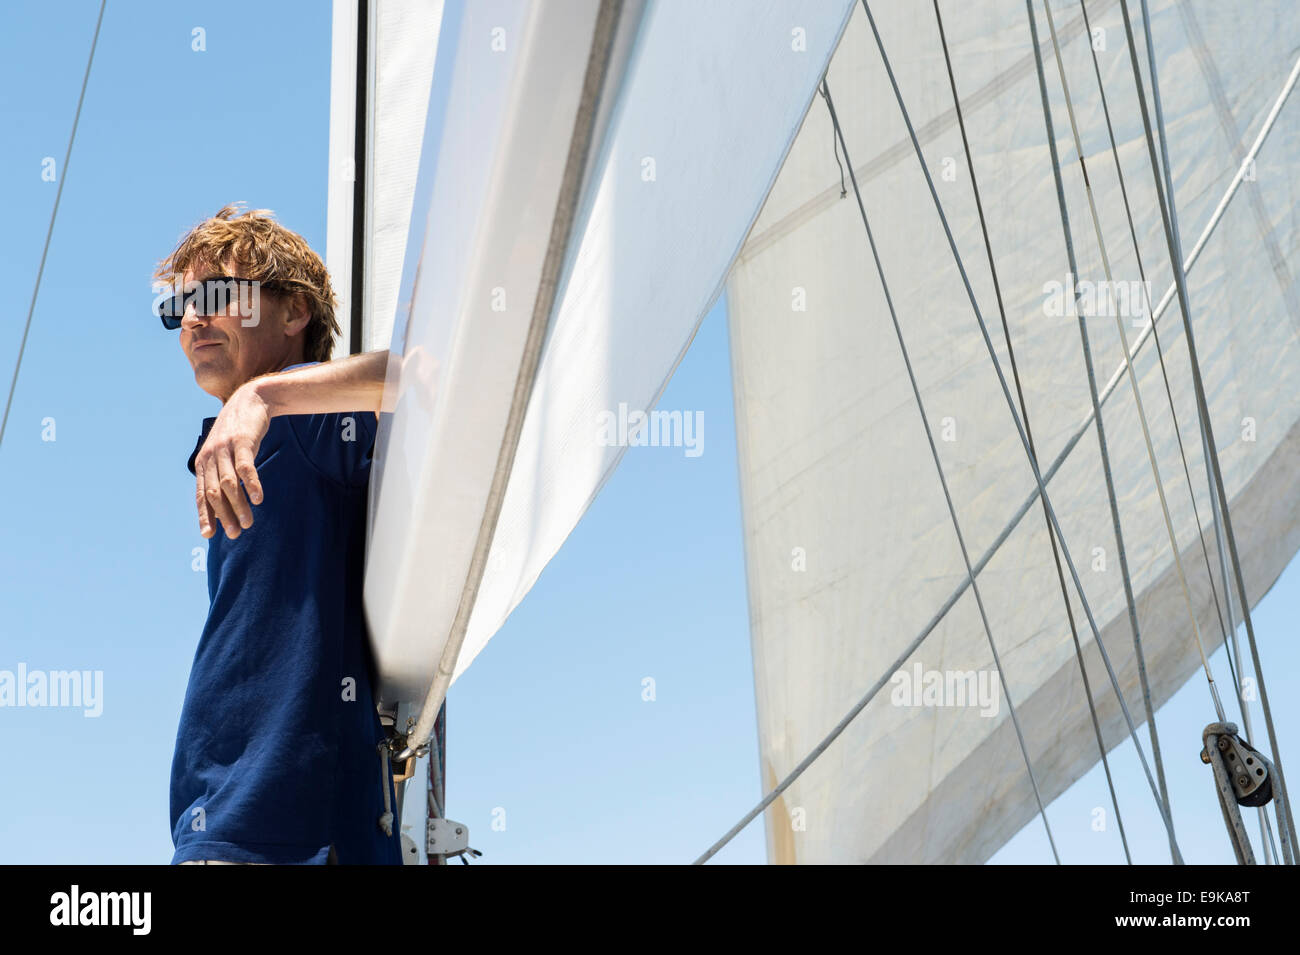 Vue latérale du middle-aged man on yacht Photo Stock